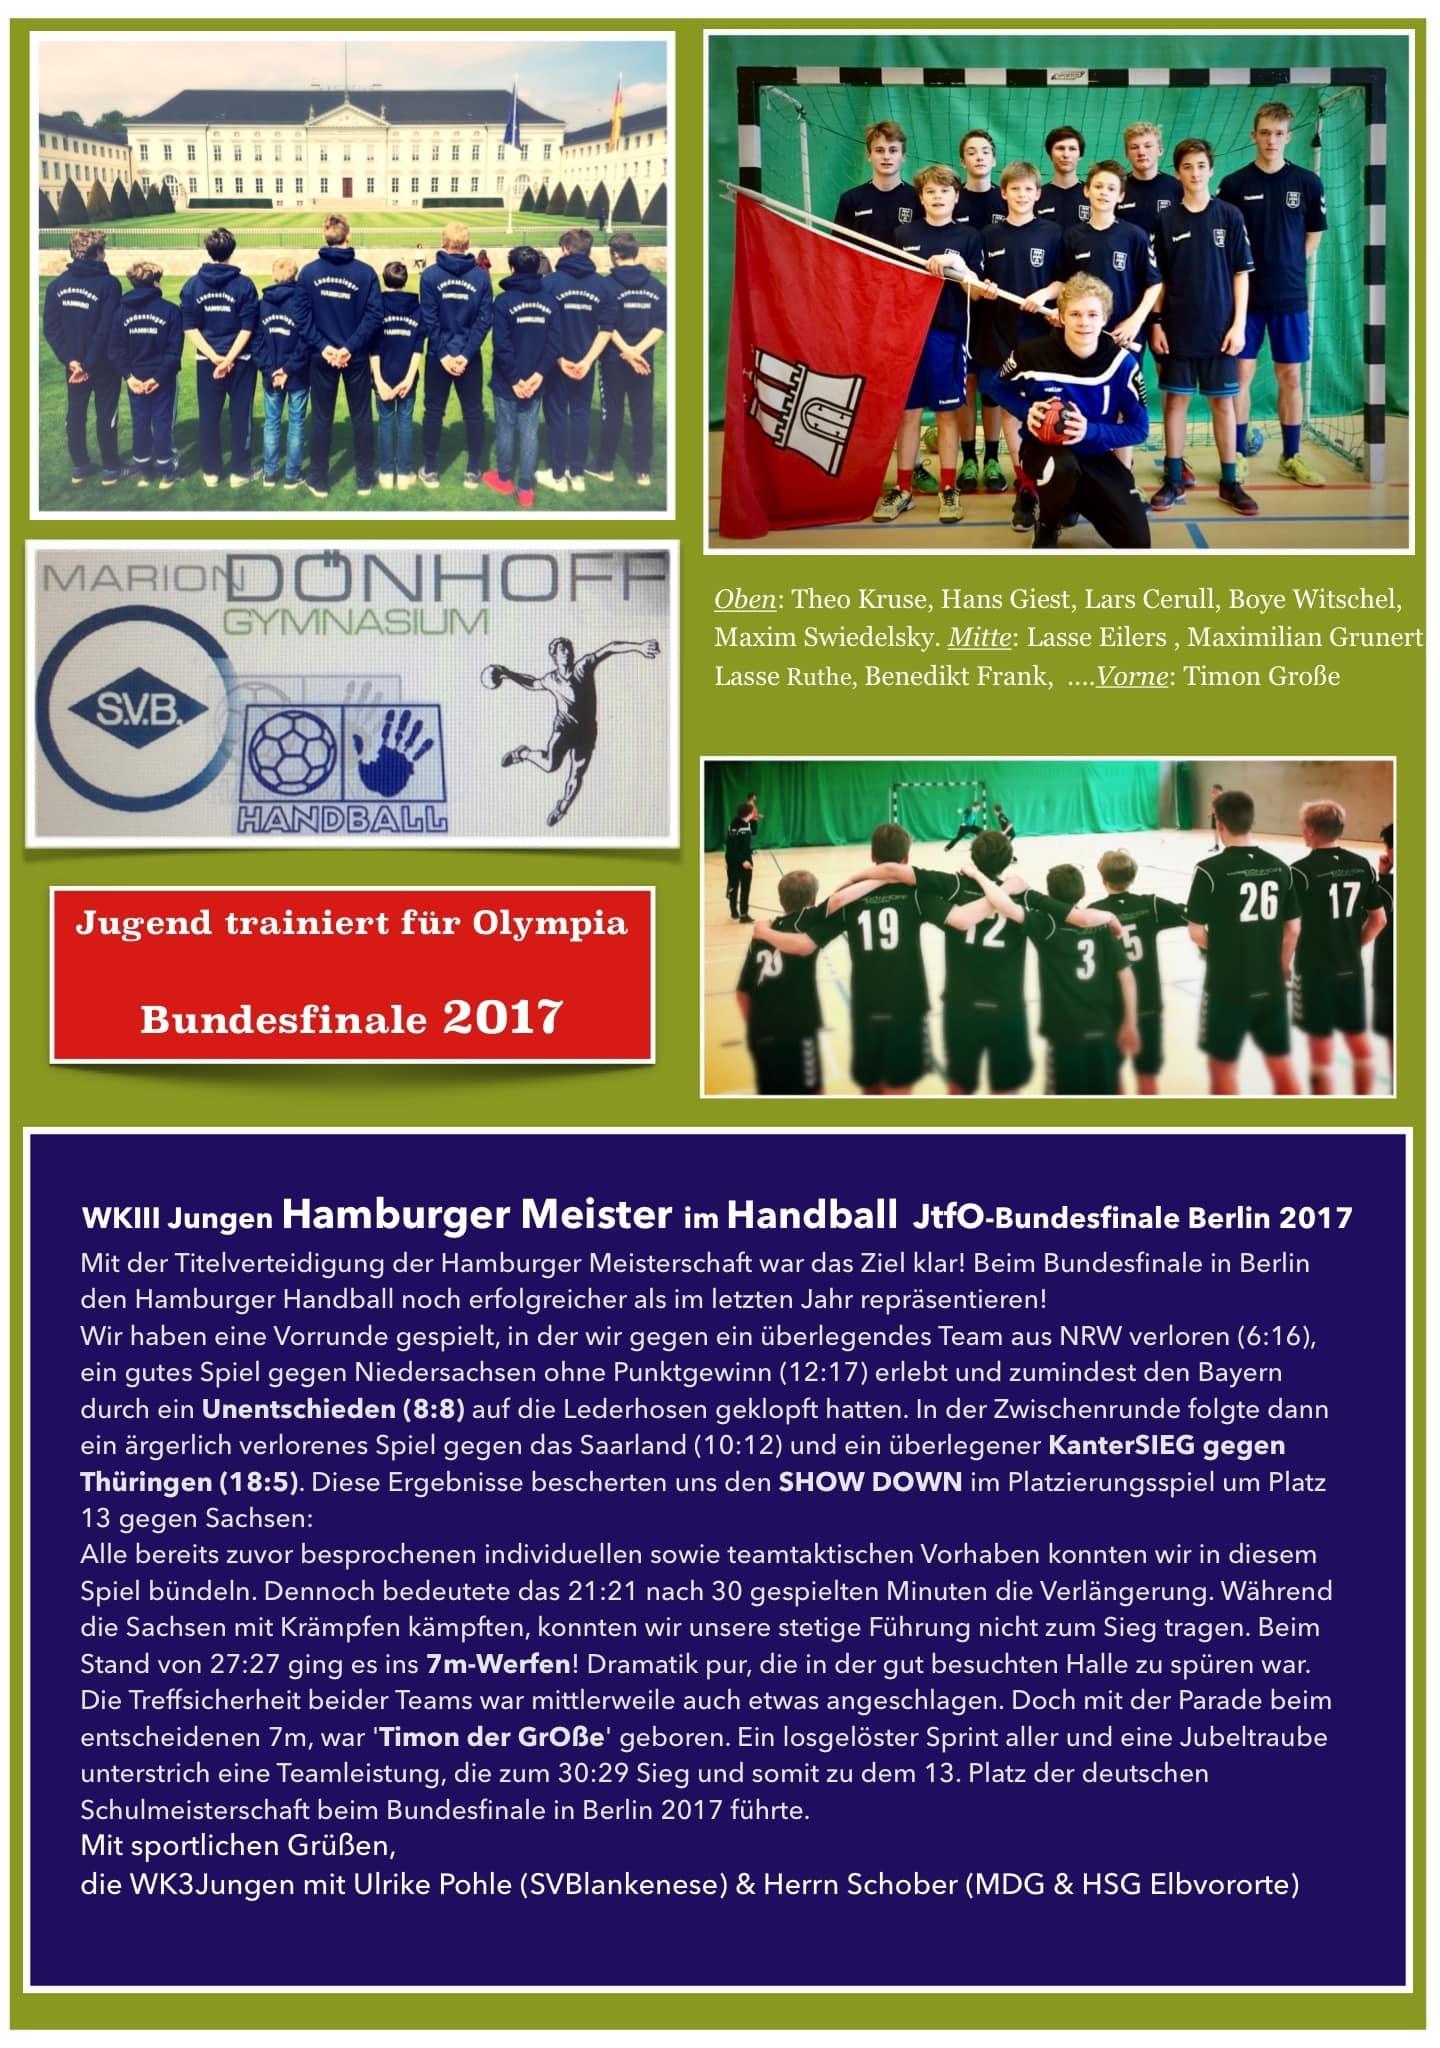 WKIII Jungen Hamburger Meister im Handball  JtfO-Bundesfinale Berlin 2017